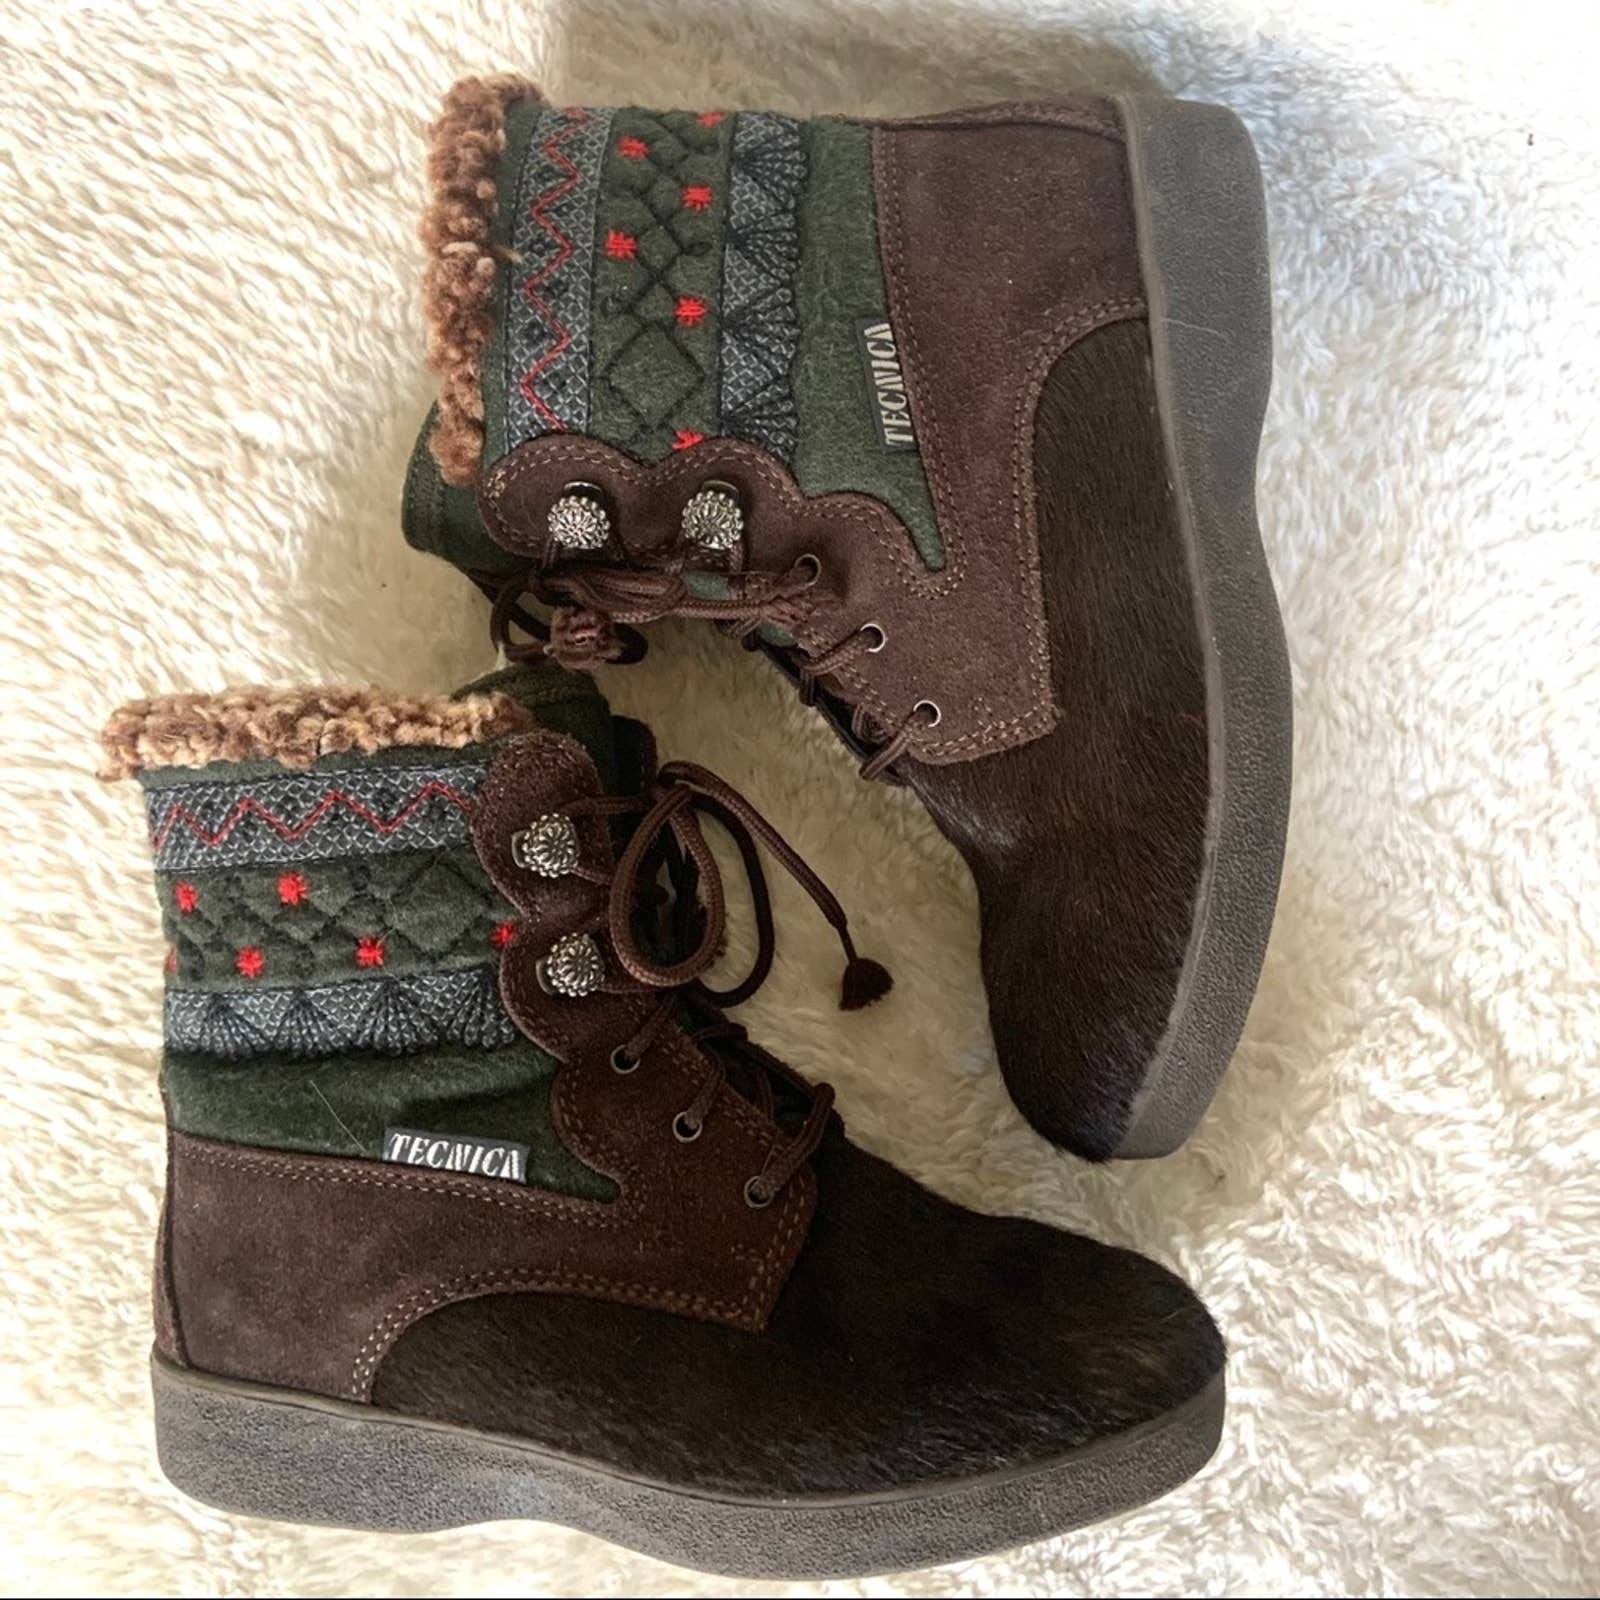 Tecnica vintage boots flat lace up  6